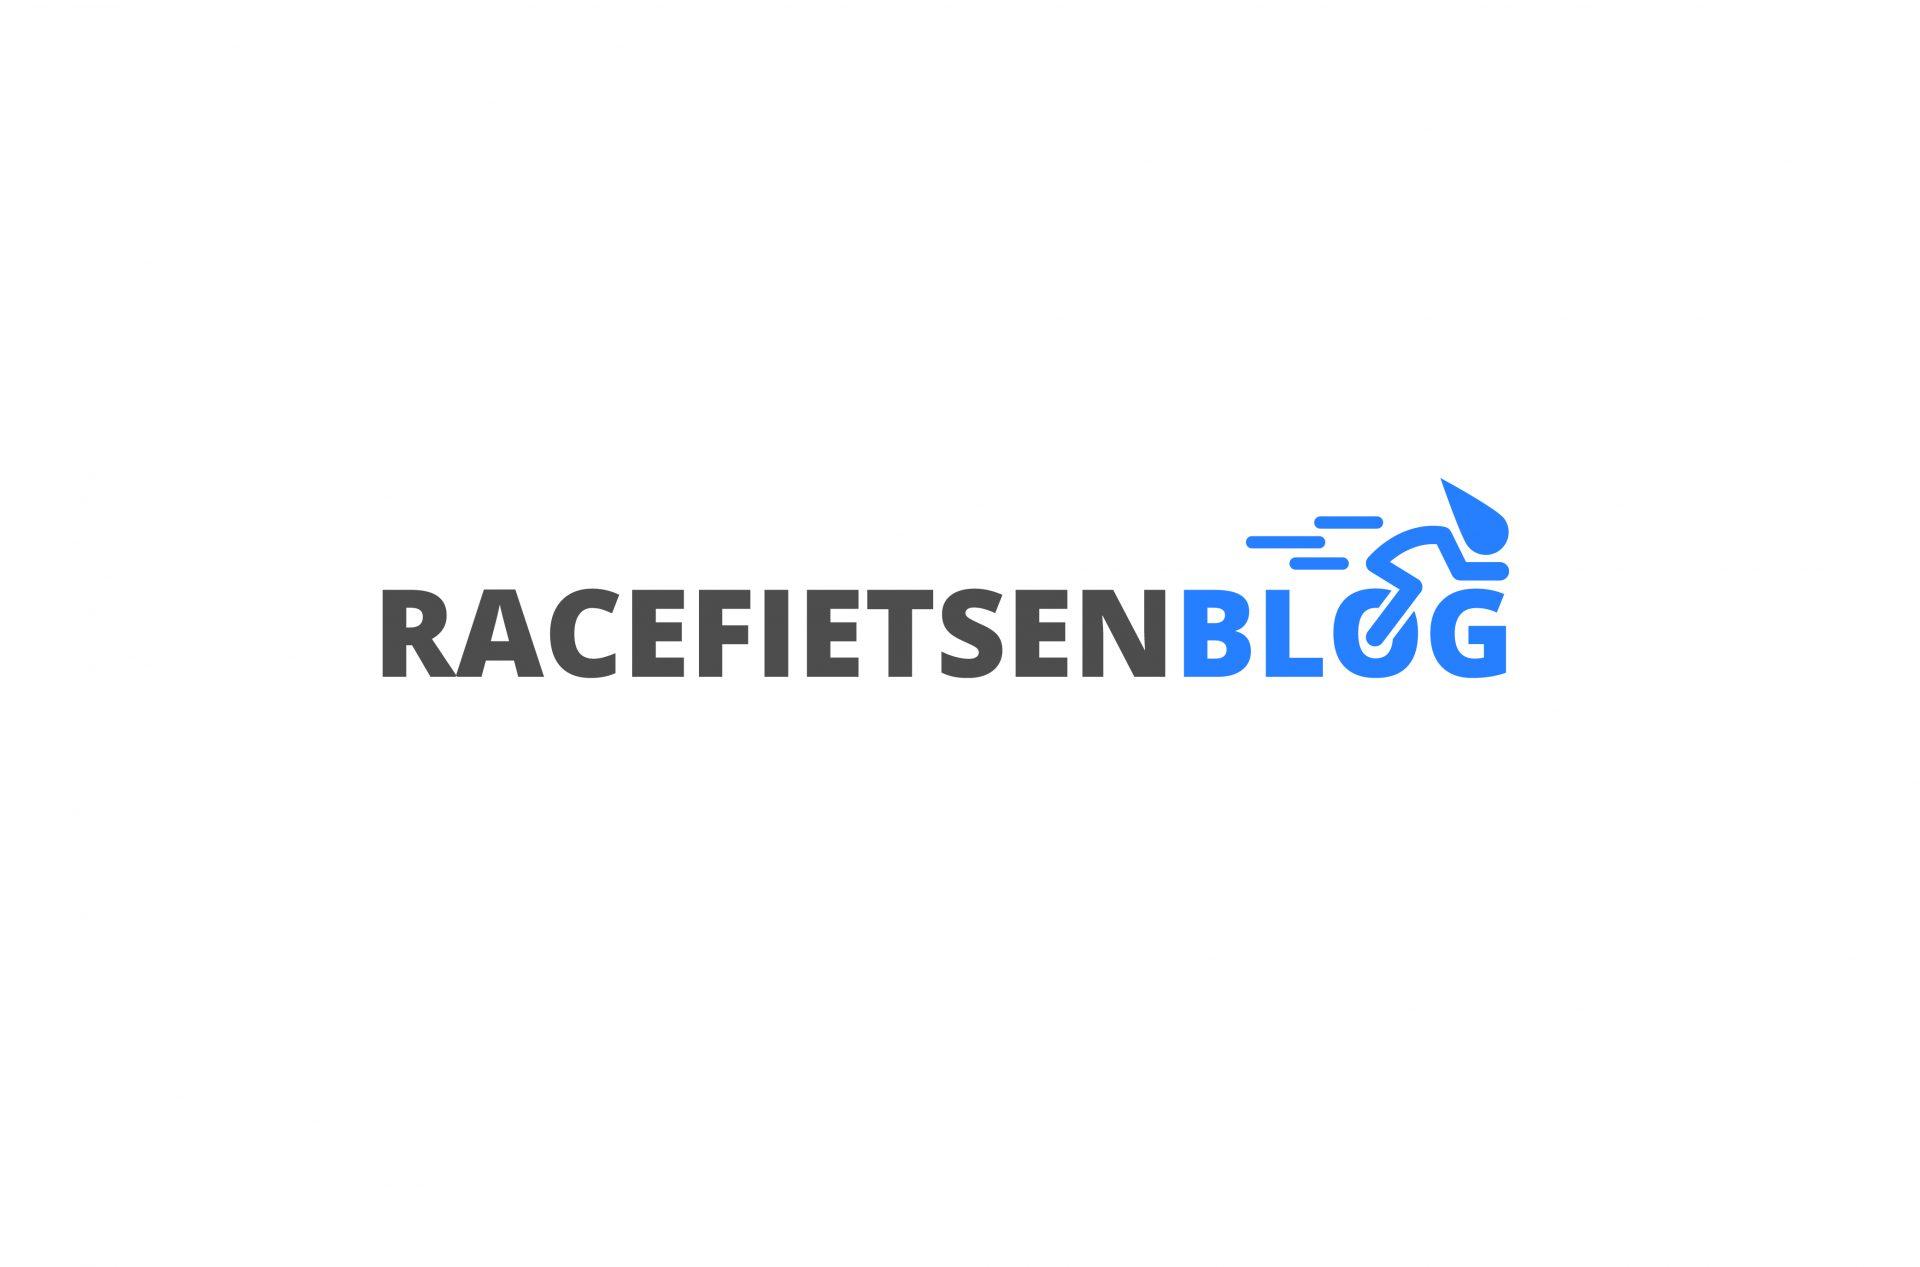 RACEFIETSENBLOG.NL IS ONLINE!